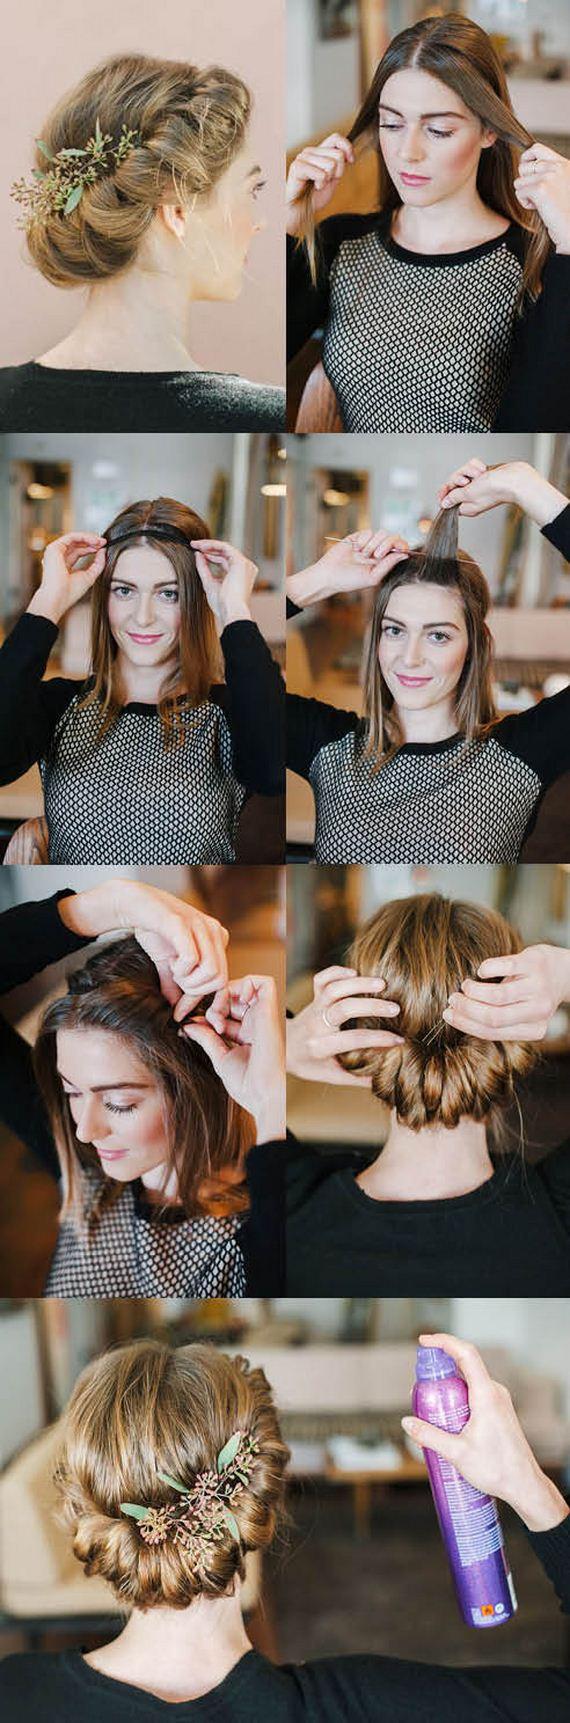 05-DIY-Hairstyles-for-Long-Hair